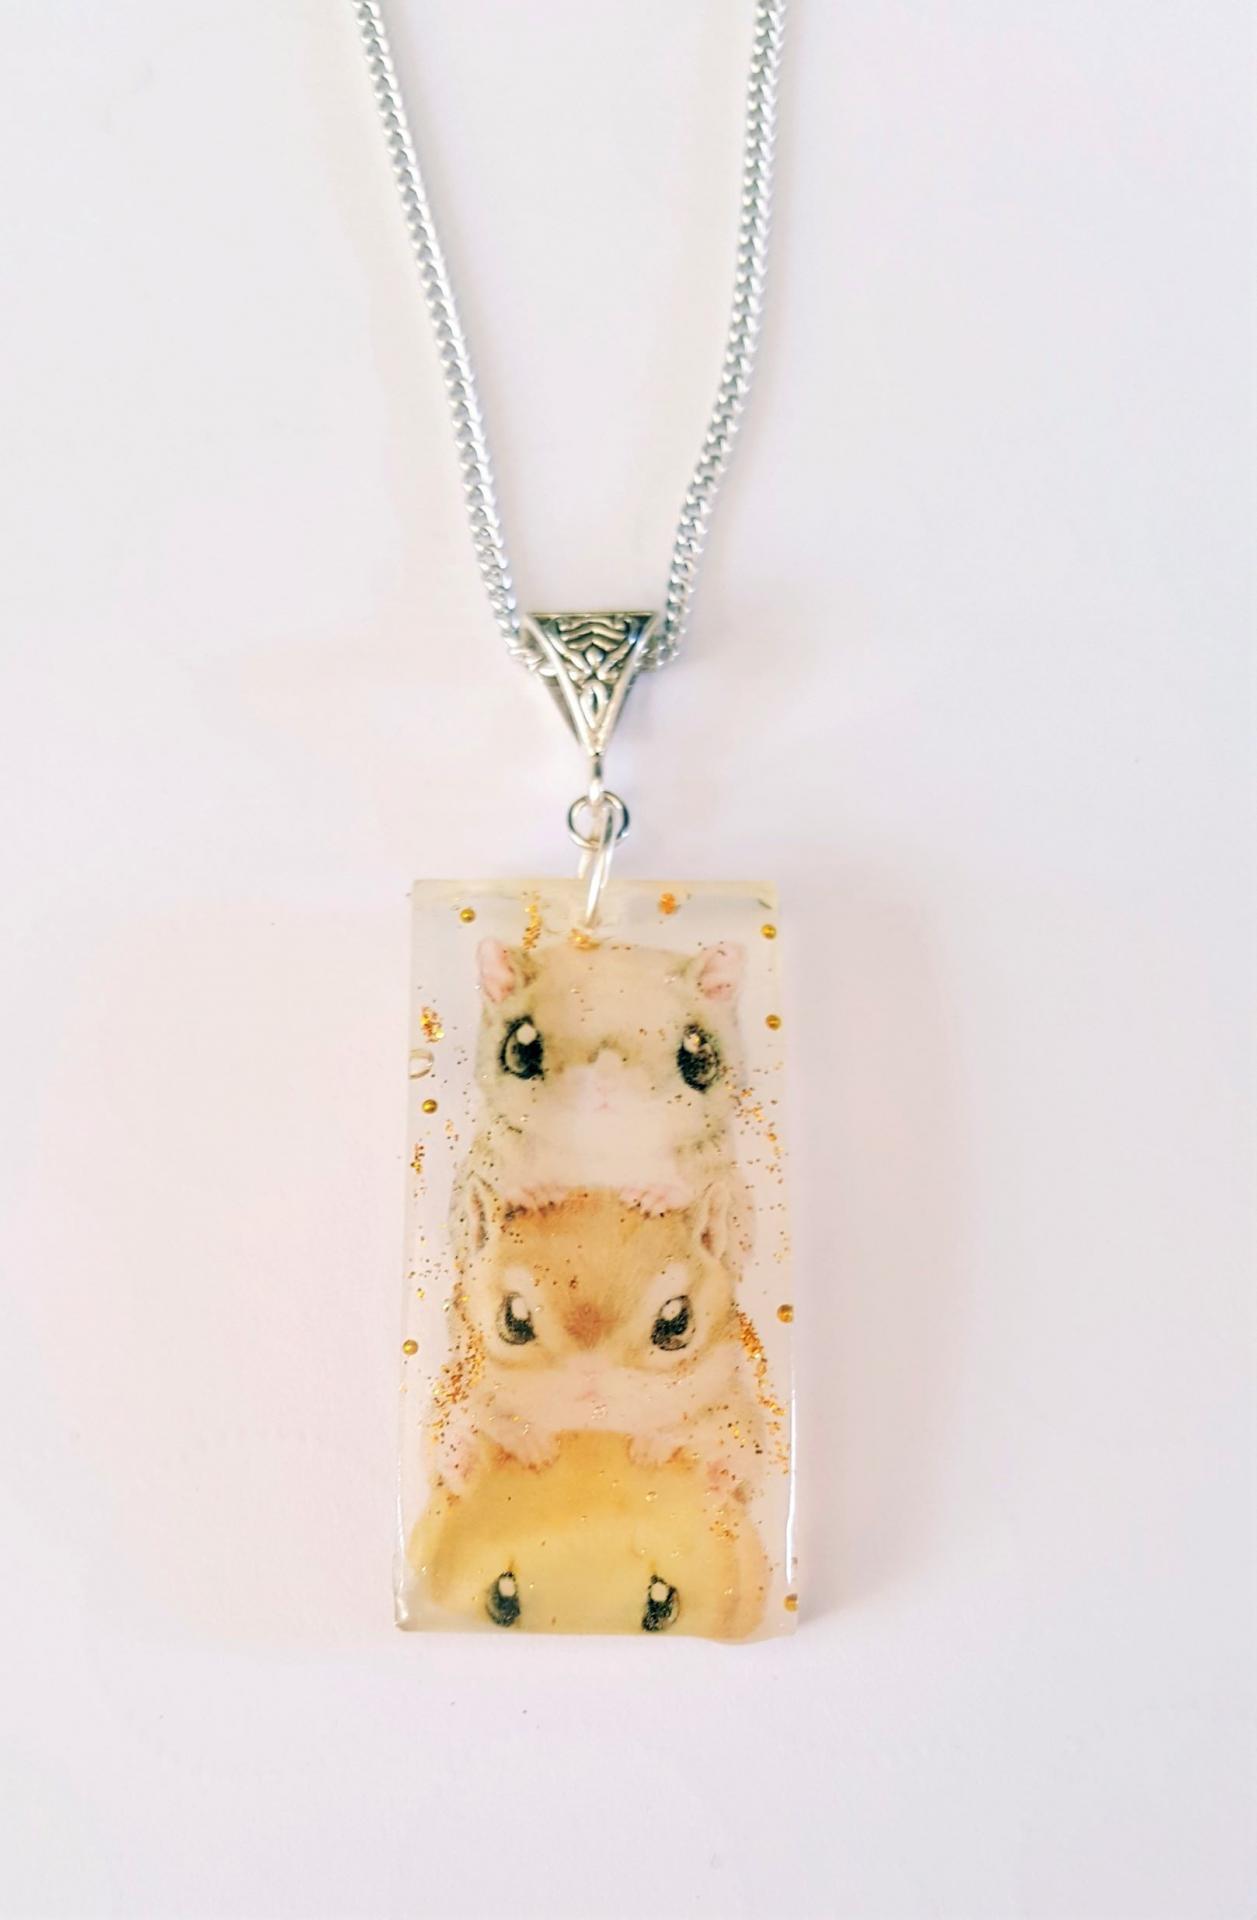 Collier resine hamster kawaii